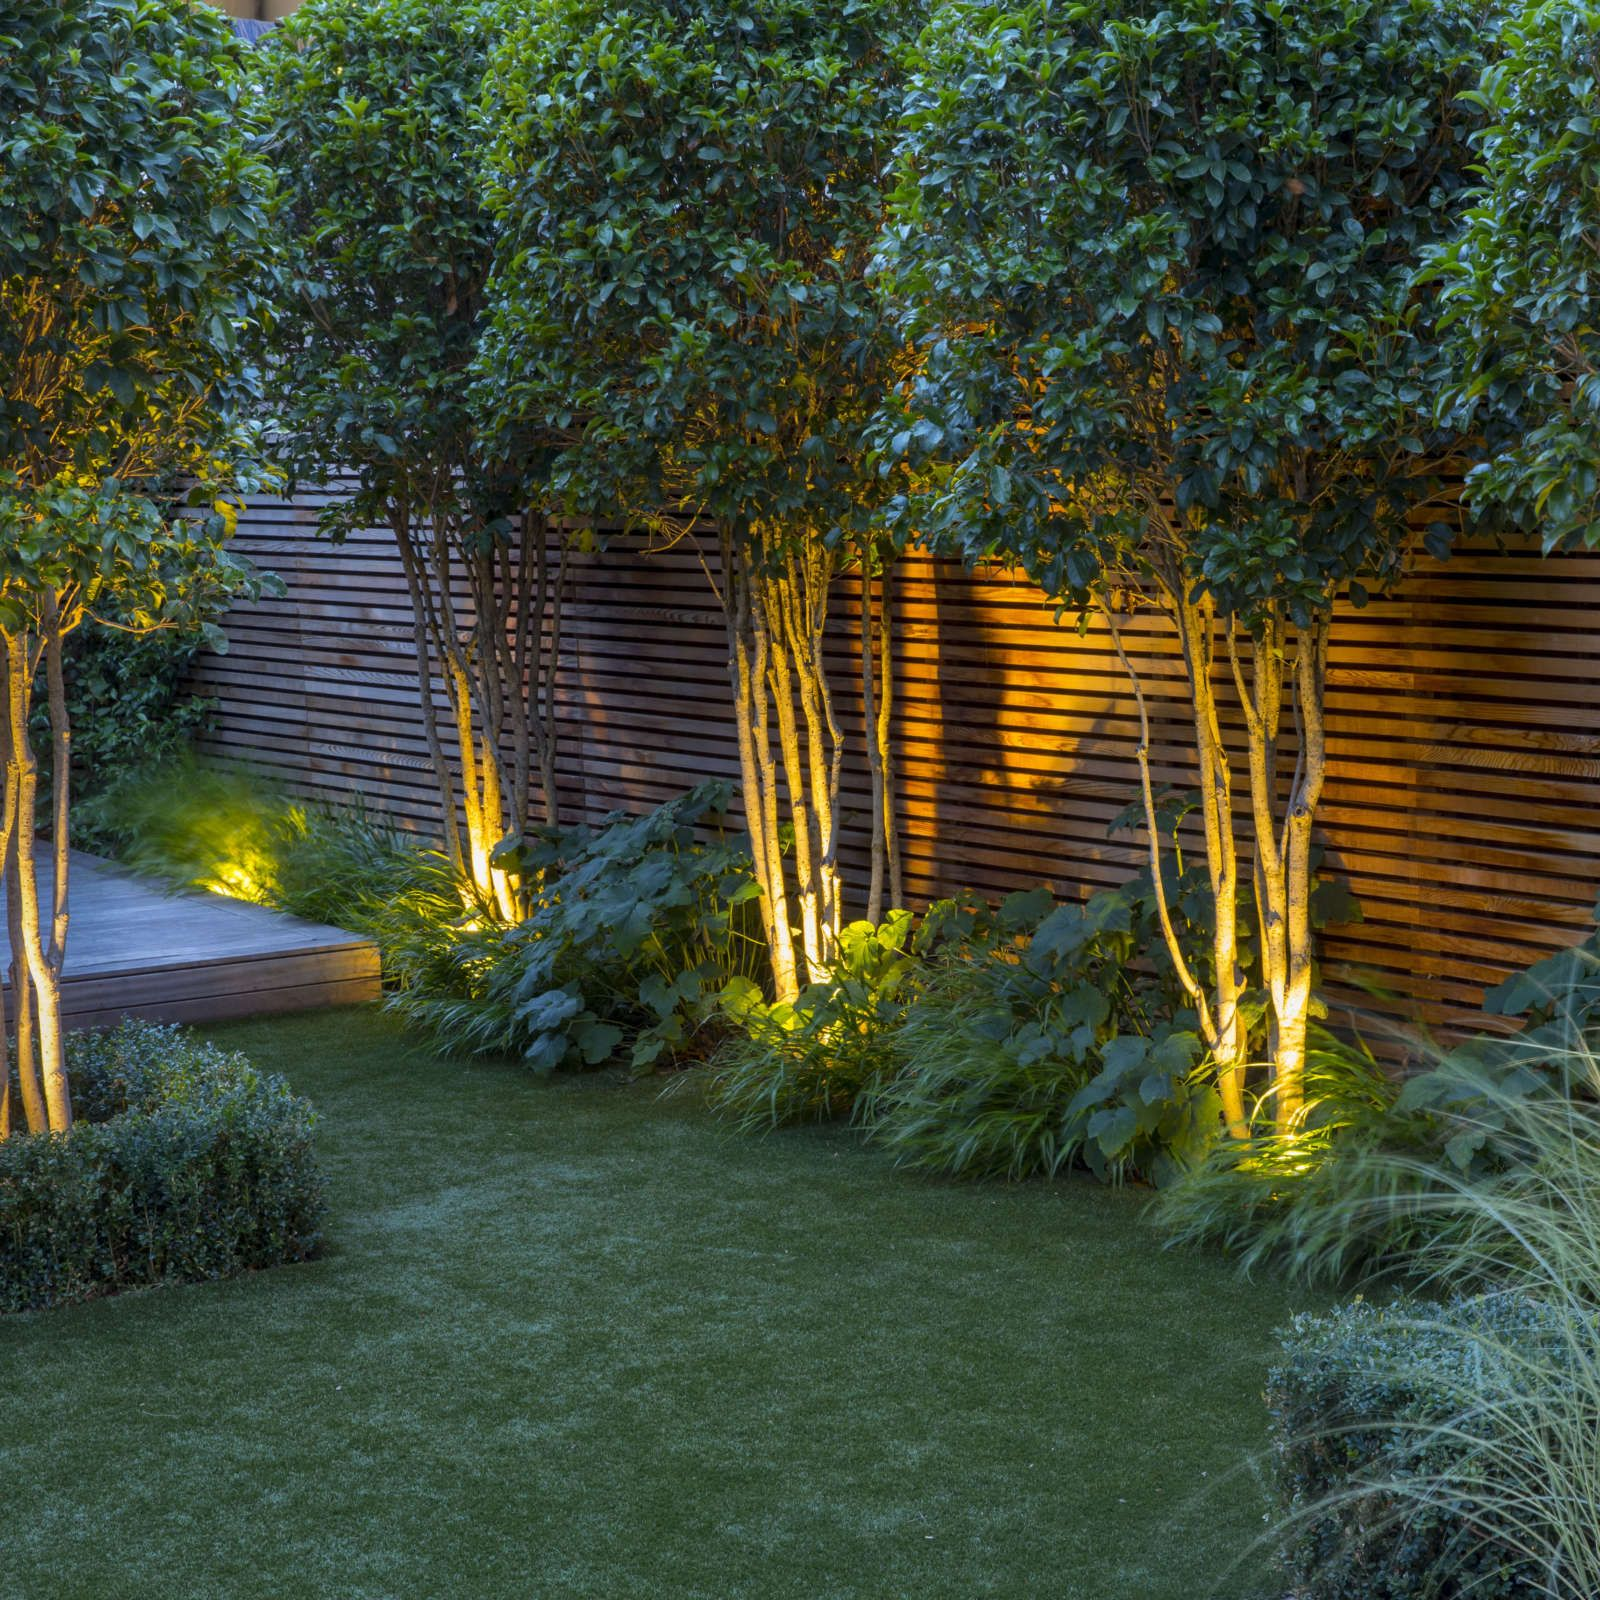 900 Ideal Landscape In 2021 Garden Design Outdoor Gardens Backyard Landscaping